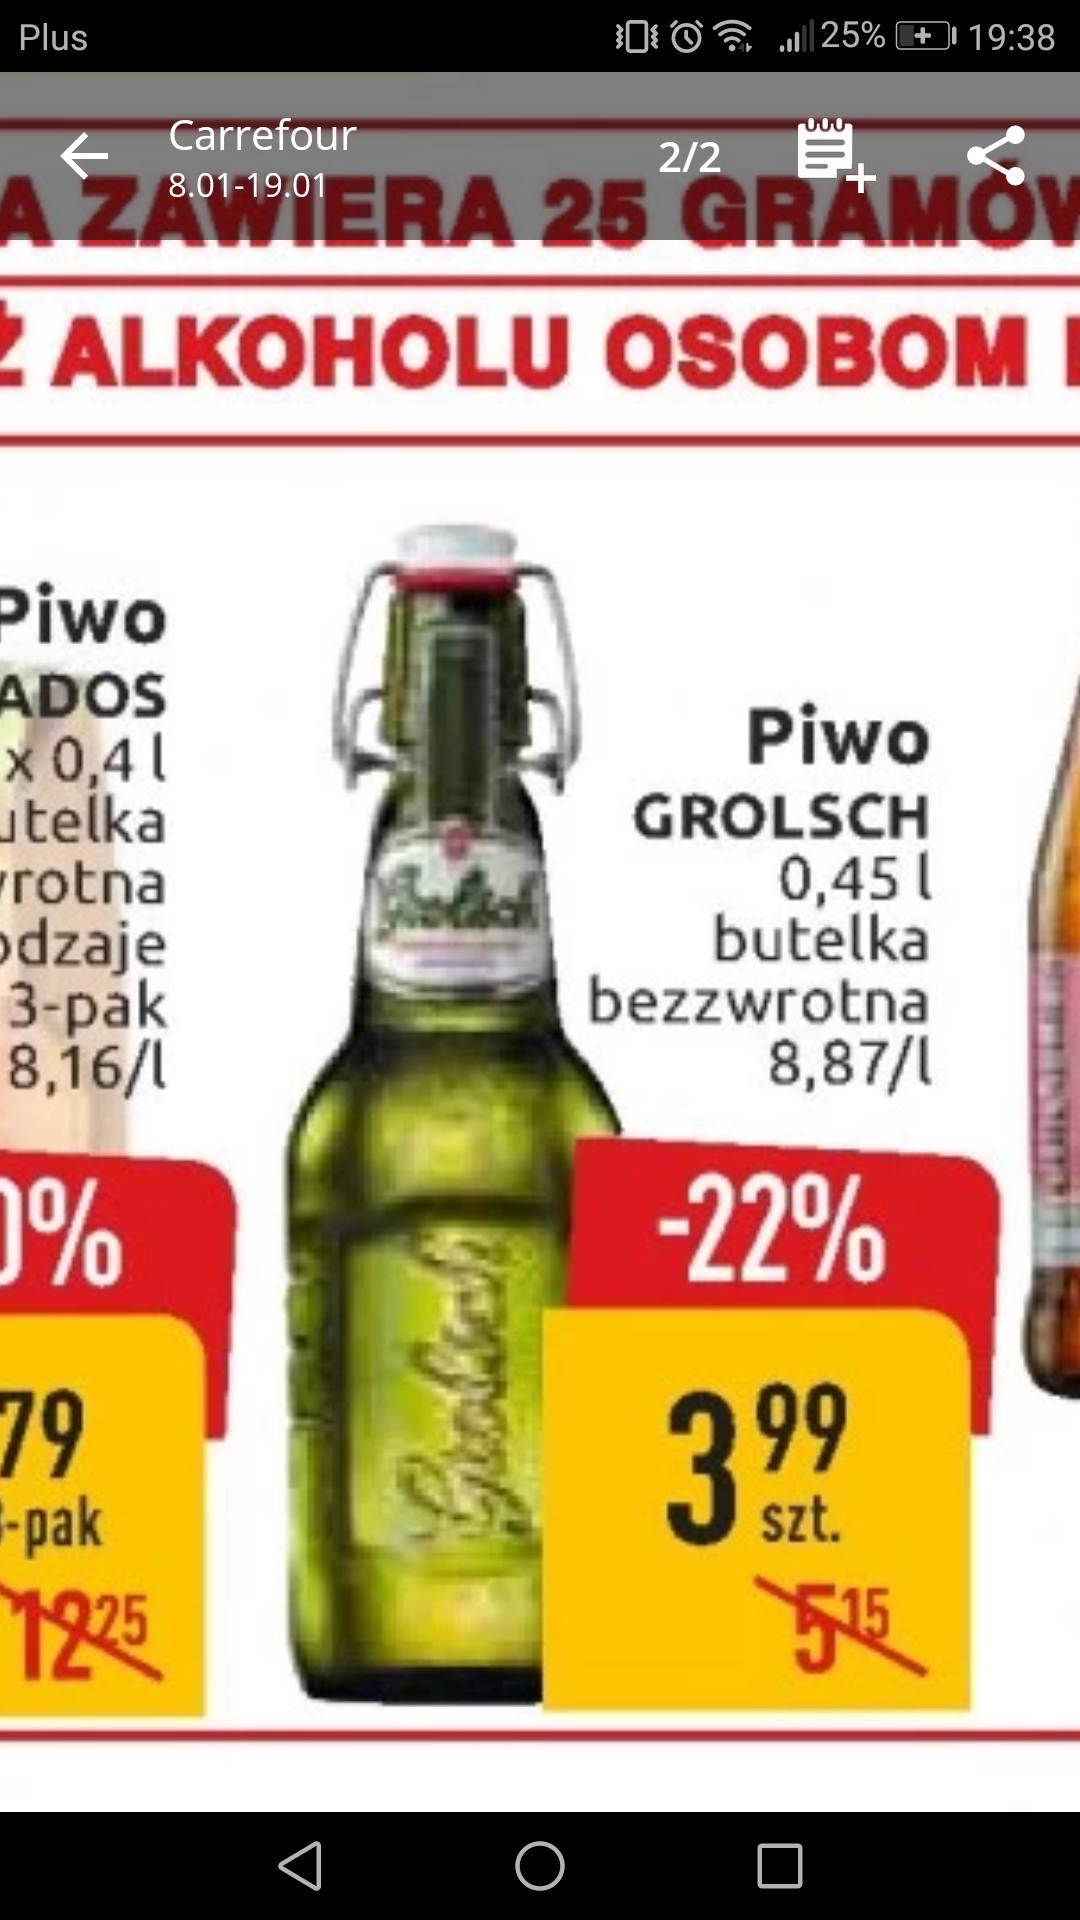 Grolsch Holenderskie piwo premium Carrefour